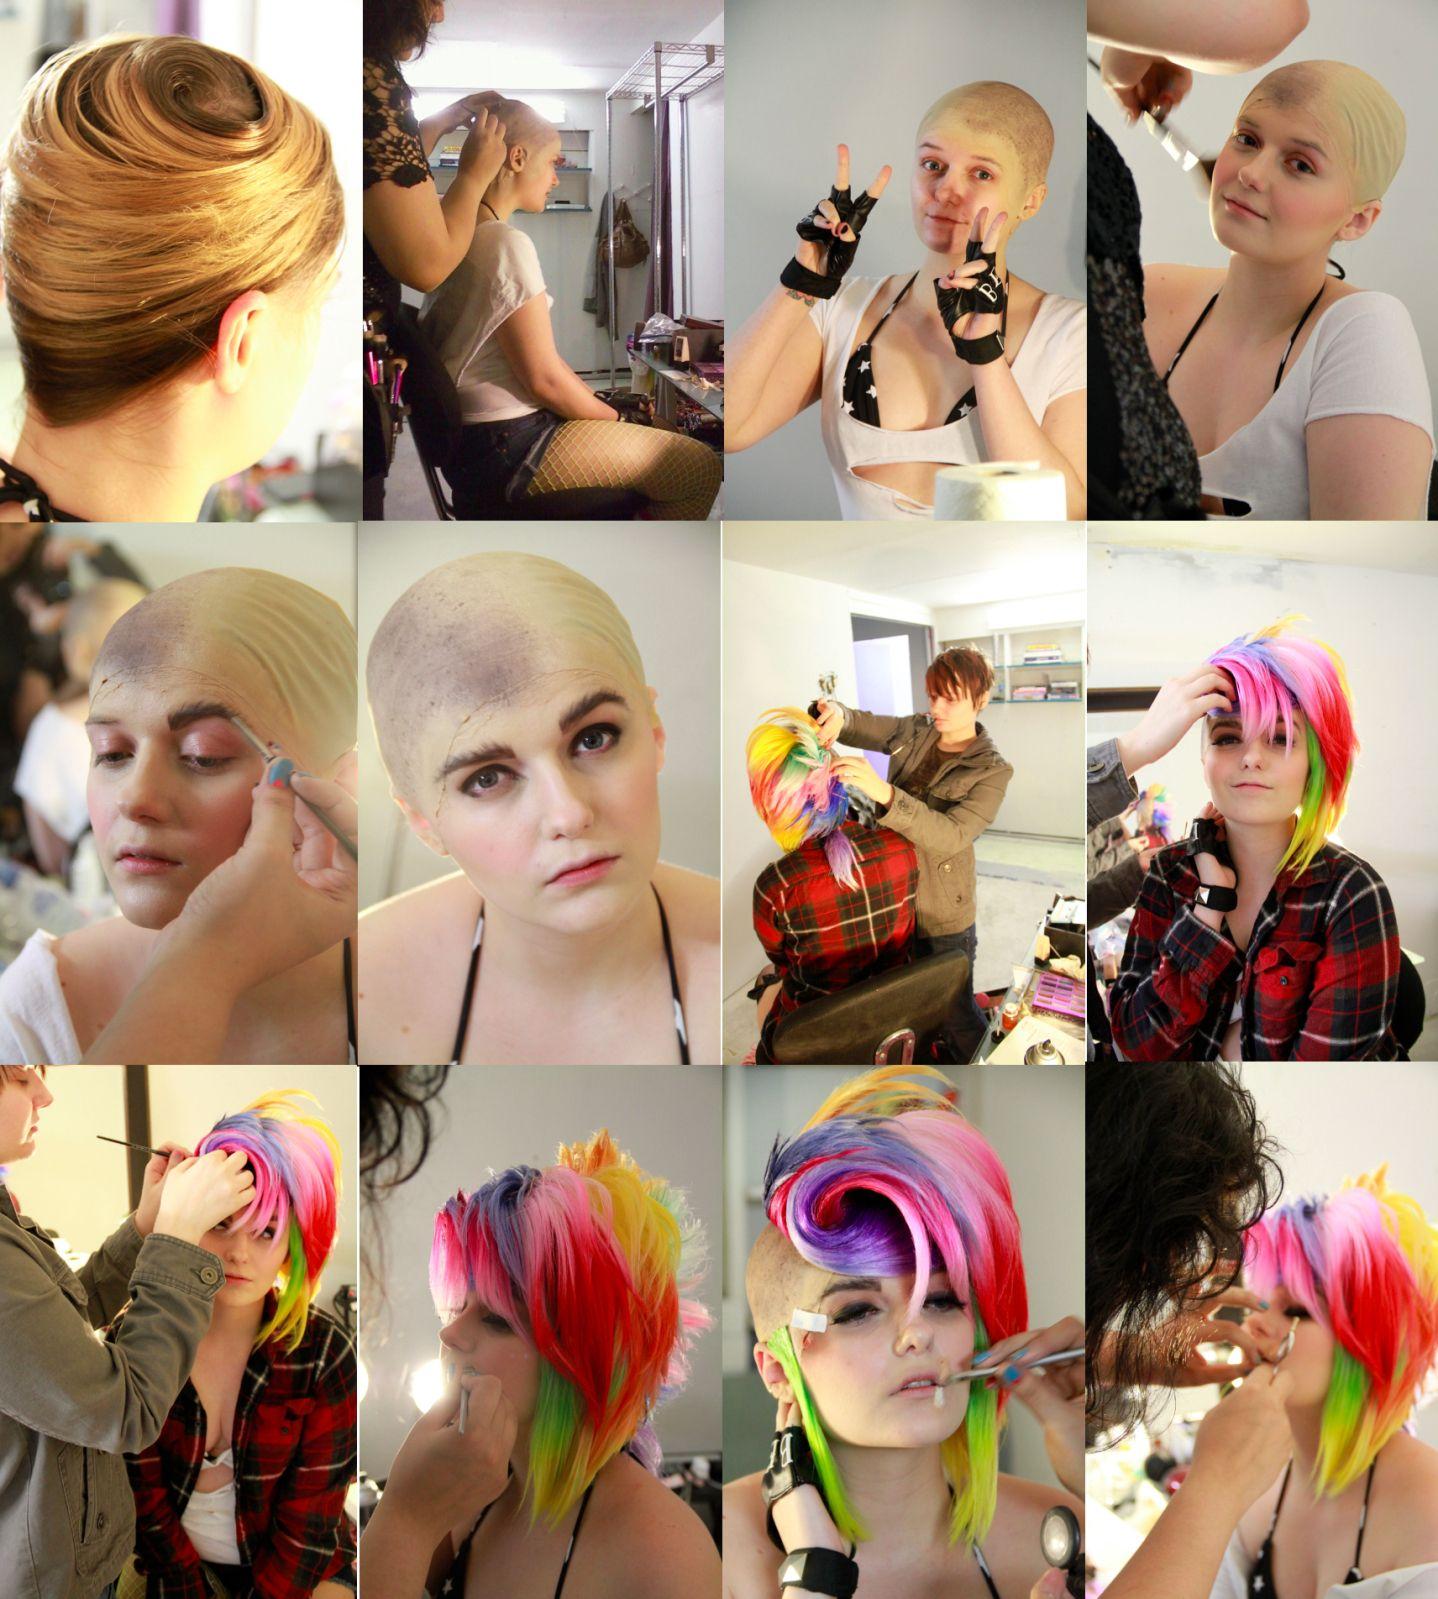 Female Bald Cosplay Ideas